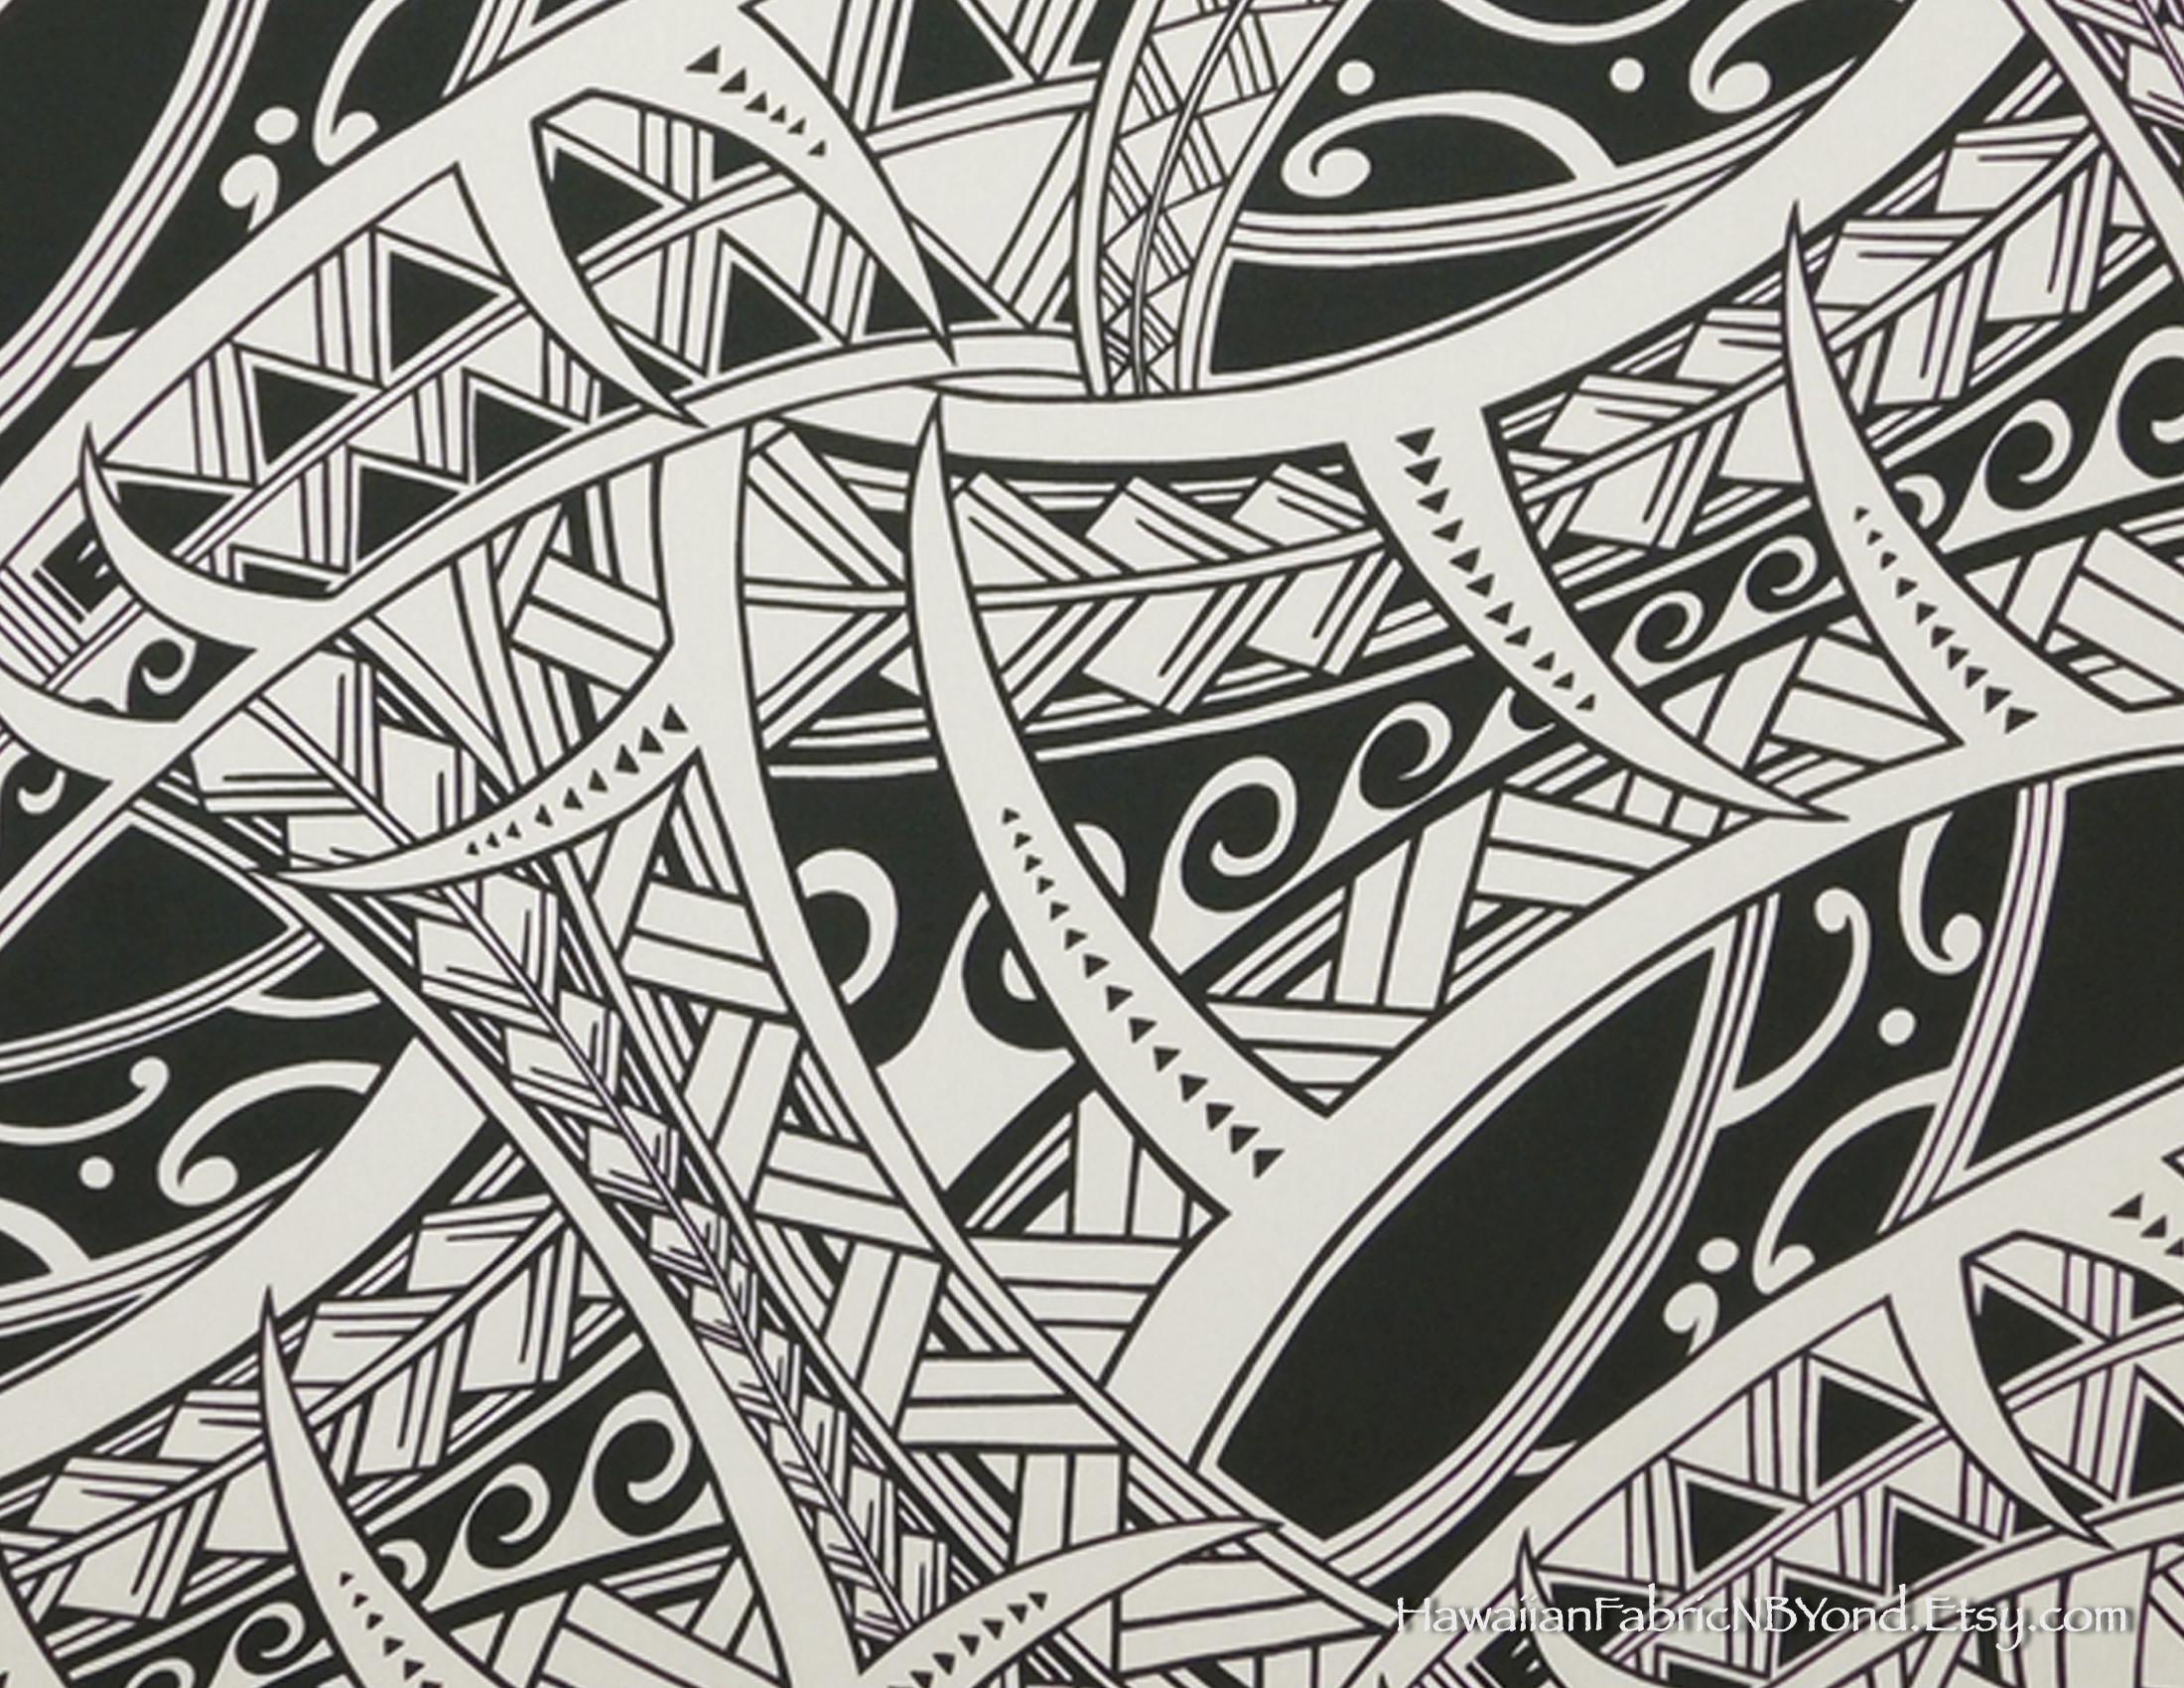 Res: 2200x1700, Polynesian Tribal Wallpaper ·① Polynesian Tribal Wallpaper ...